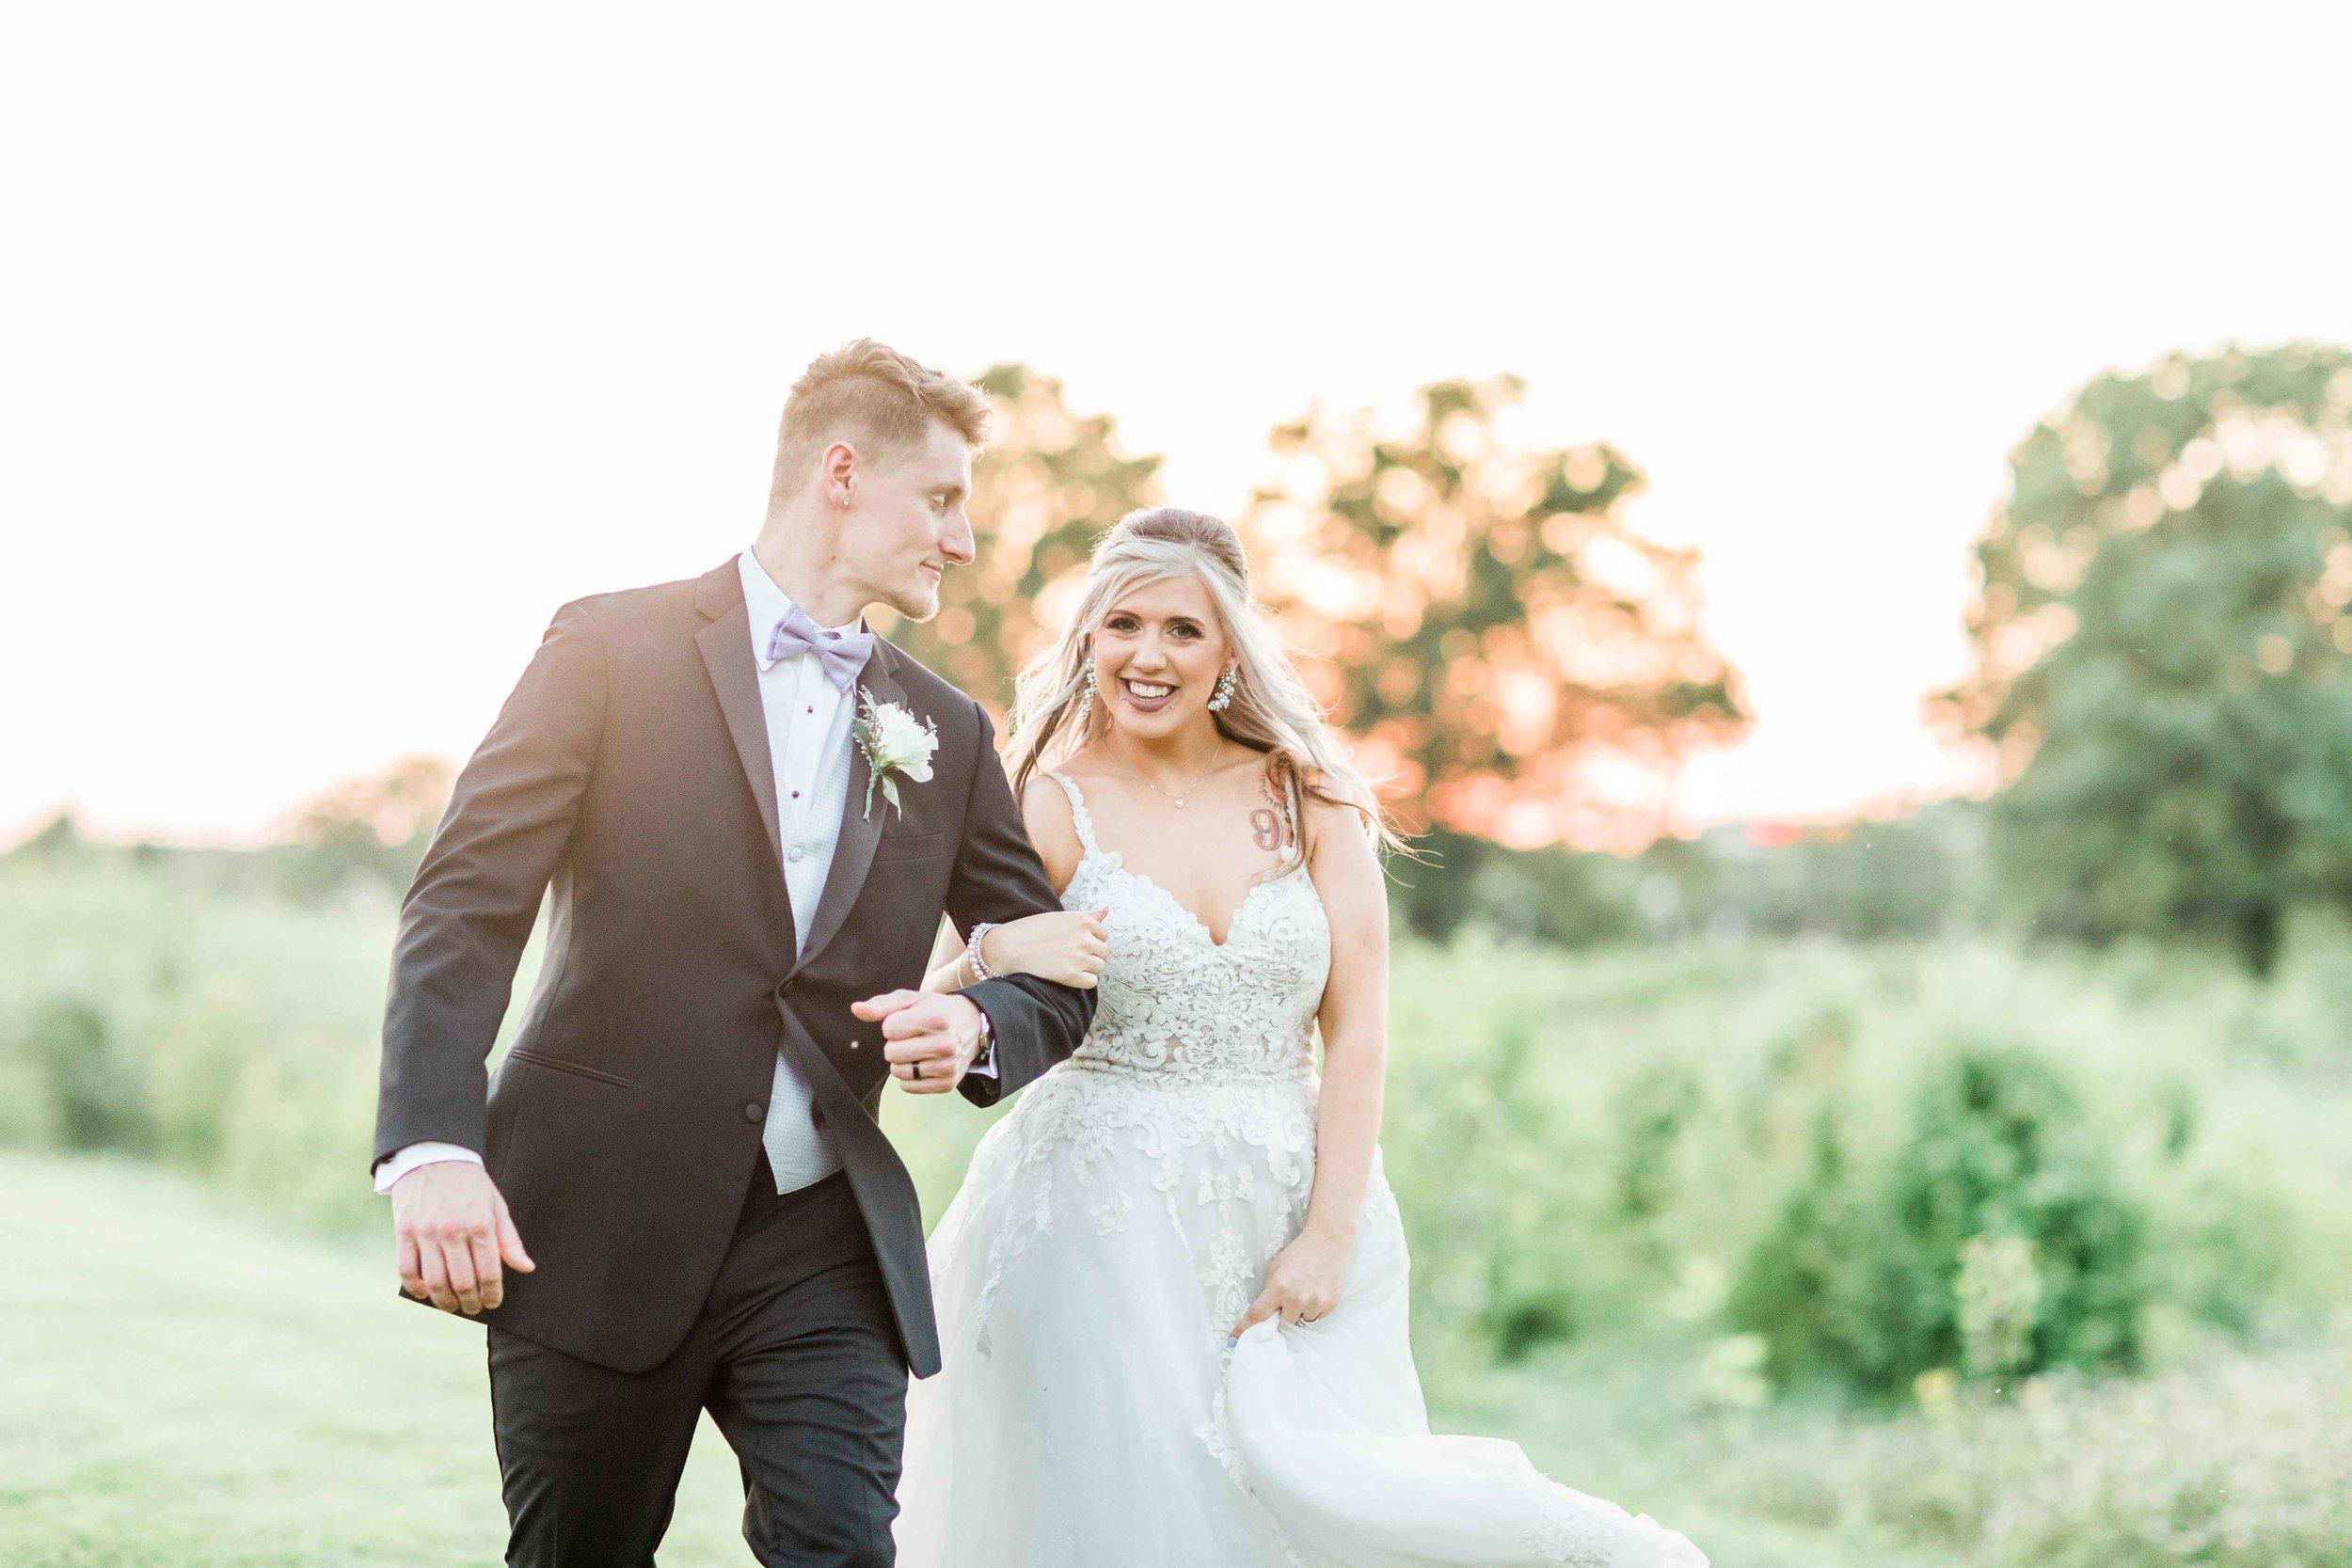 wedding photographers nky southwest ohio cincinnati dayton-7.jpg